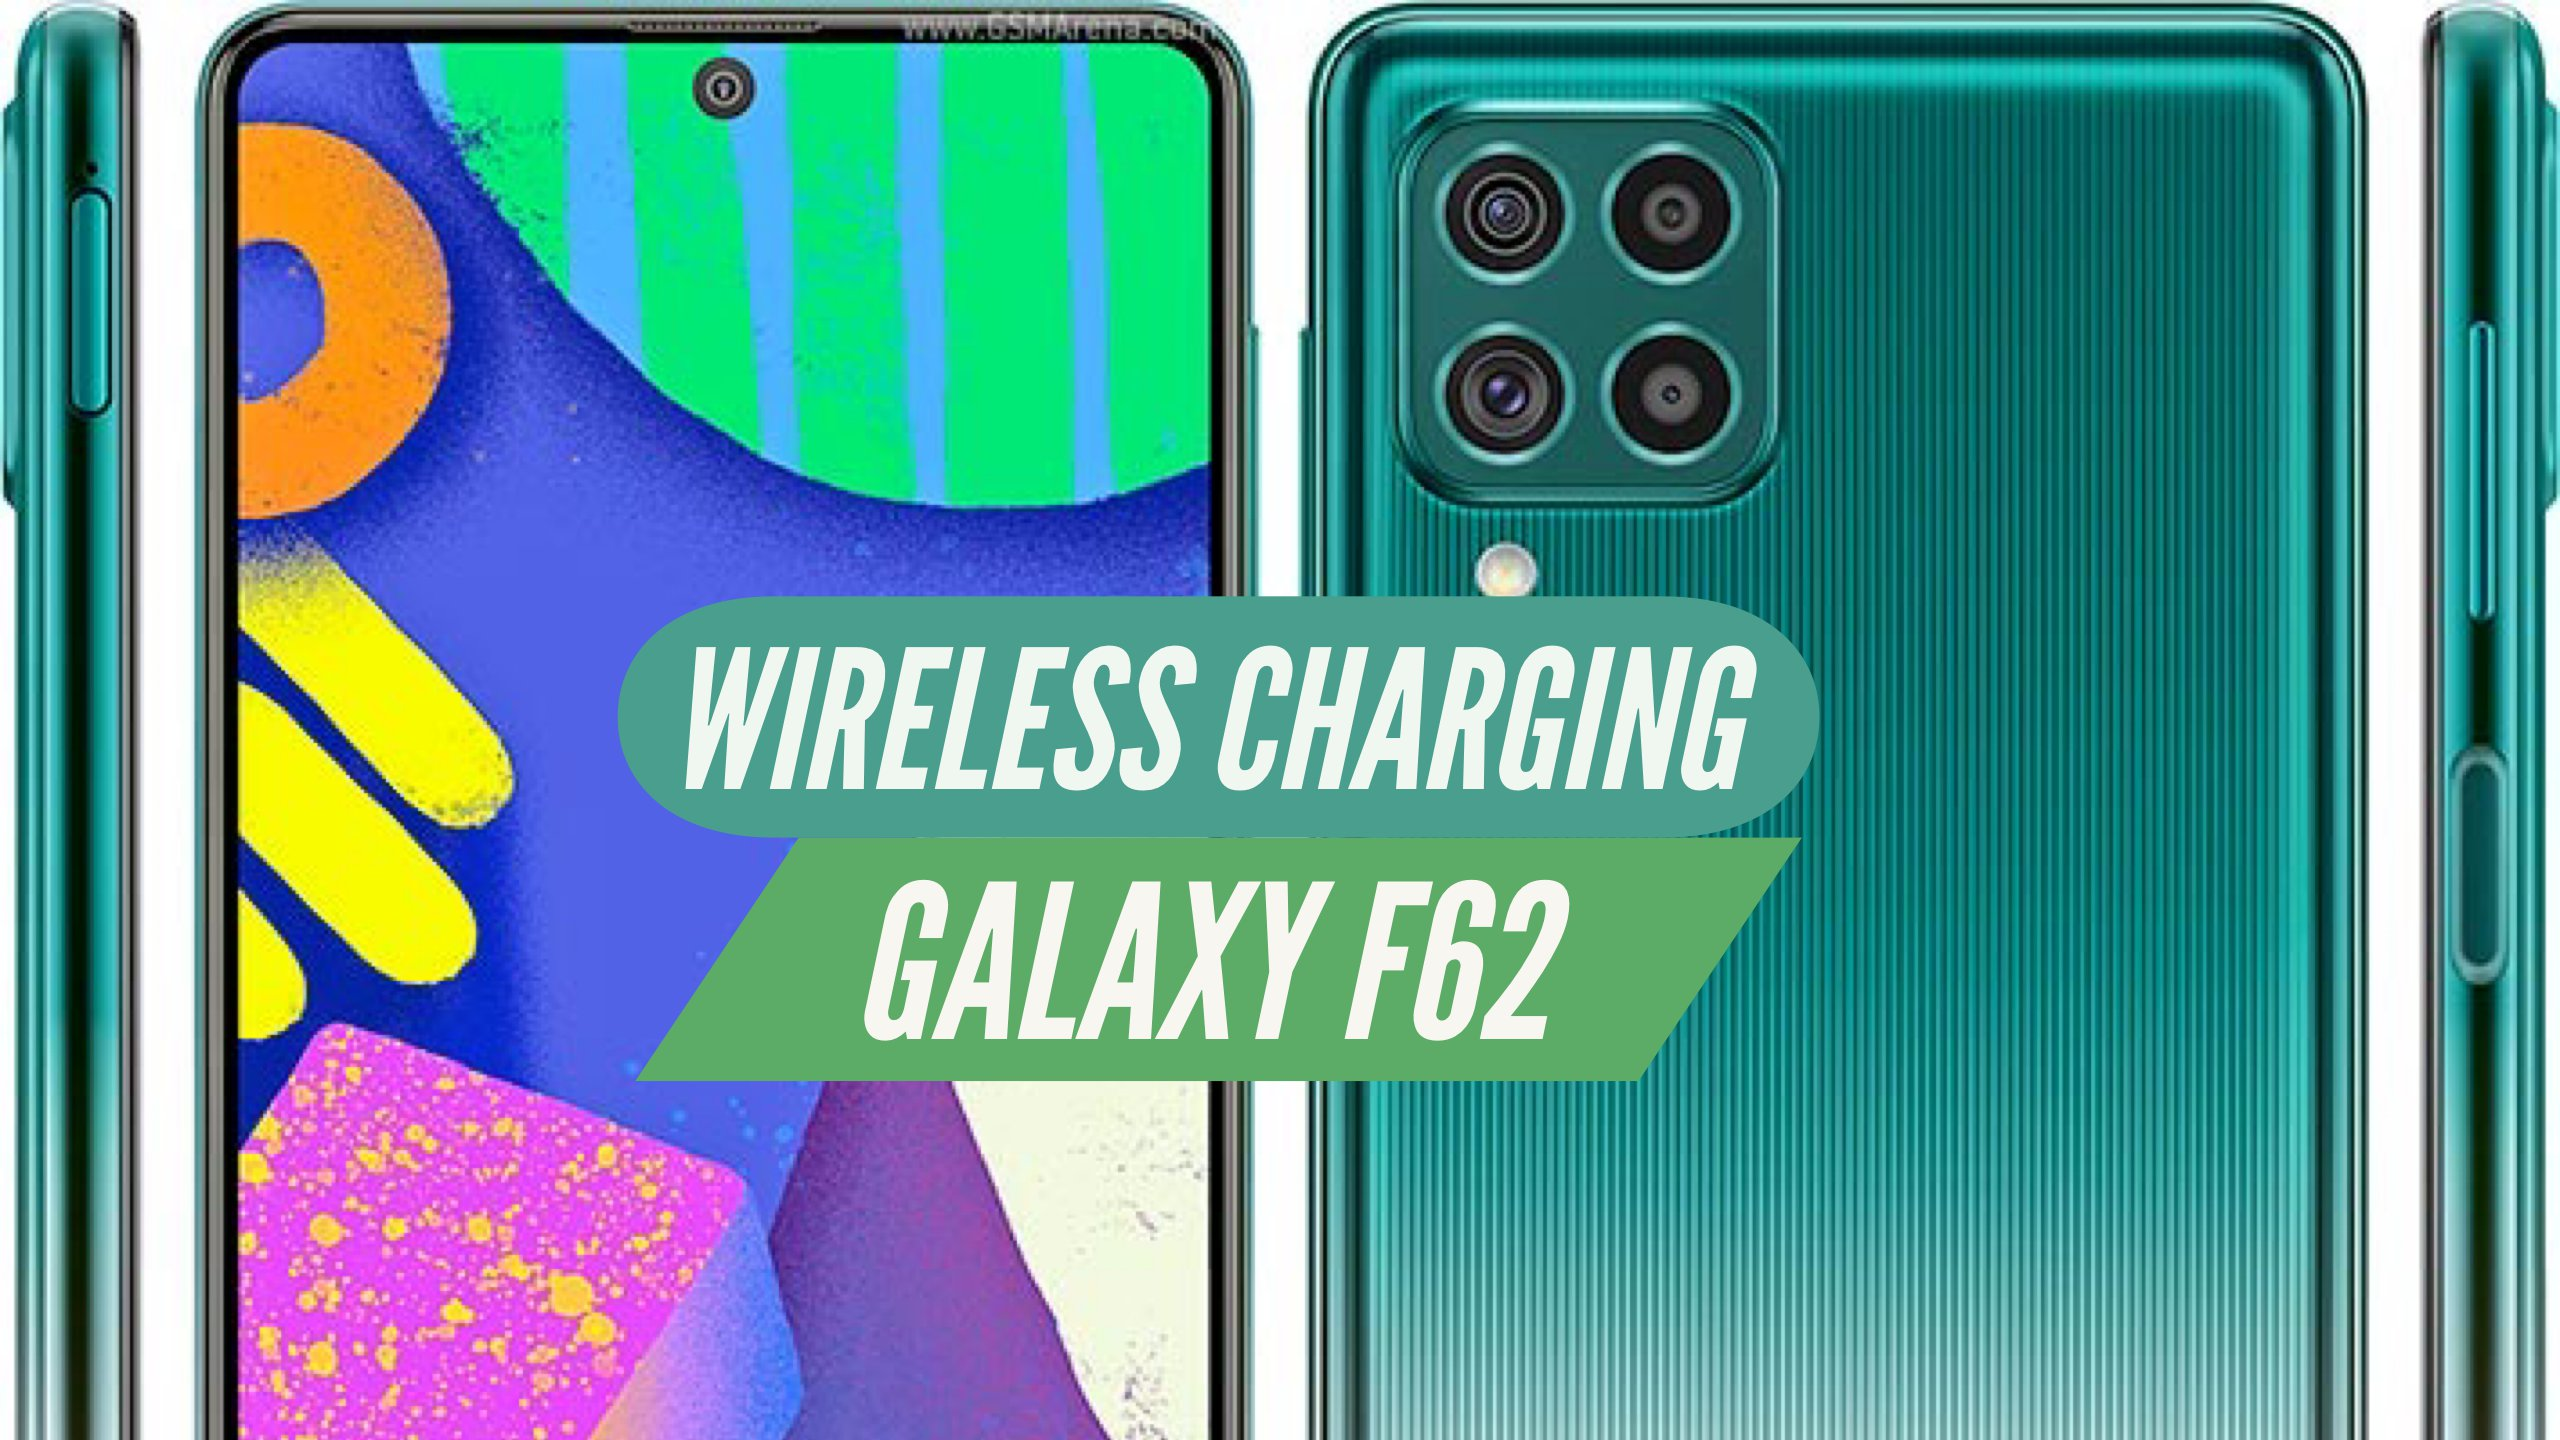 Galaxy F62 Wireless Charging